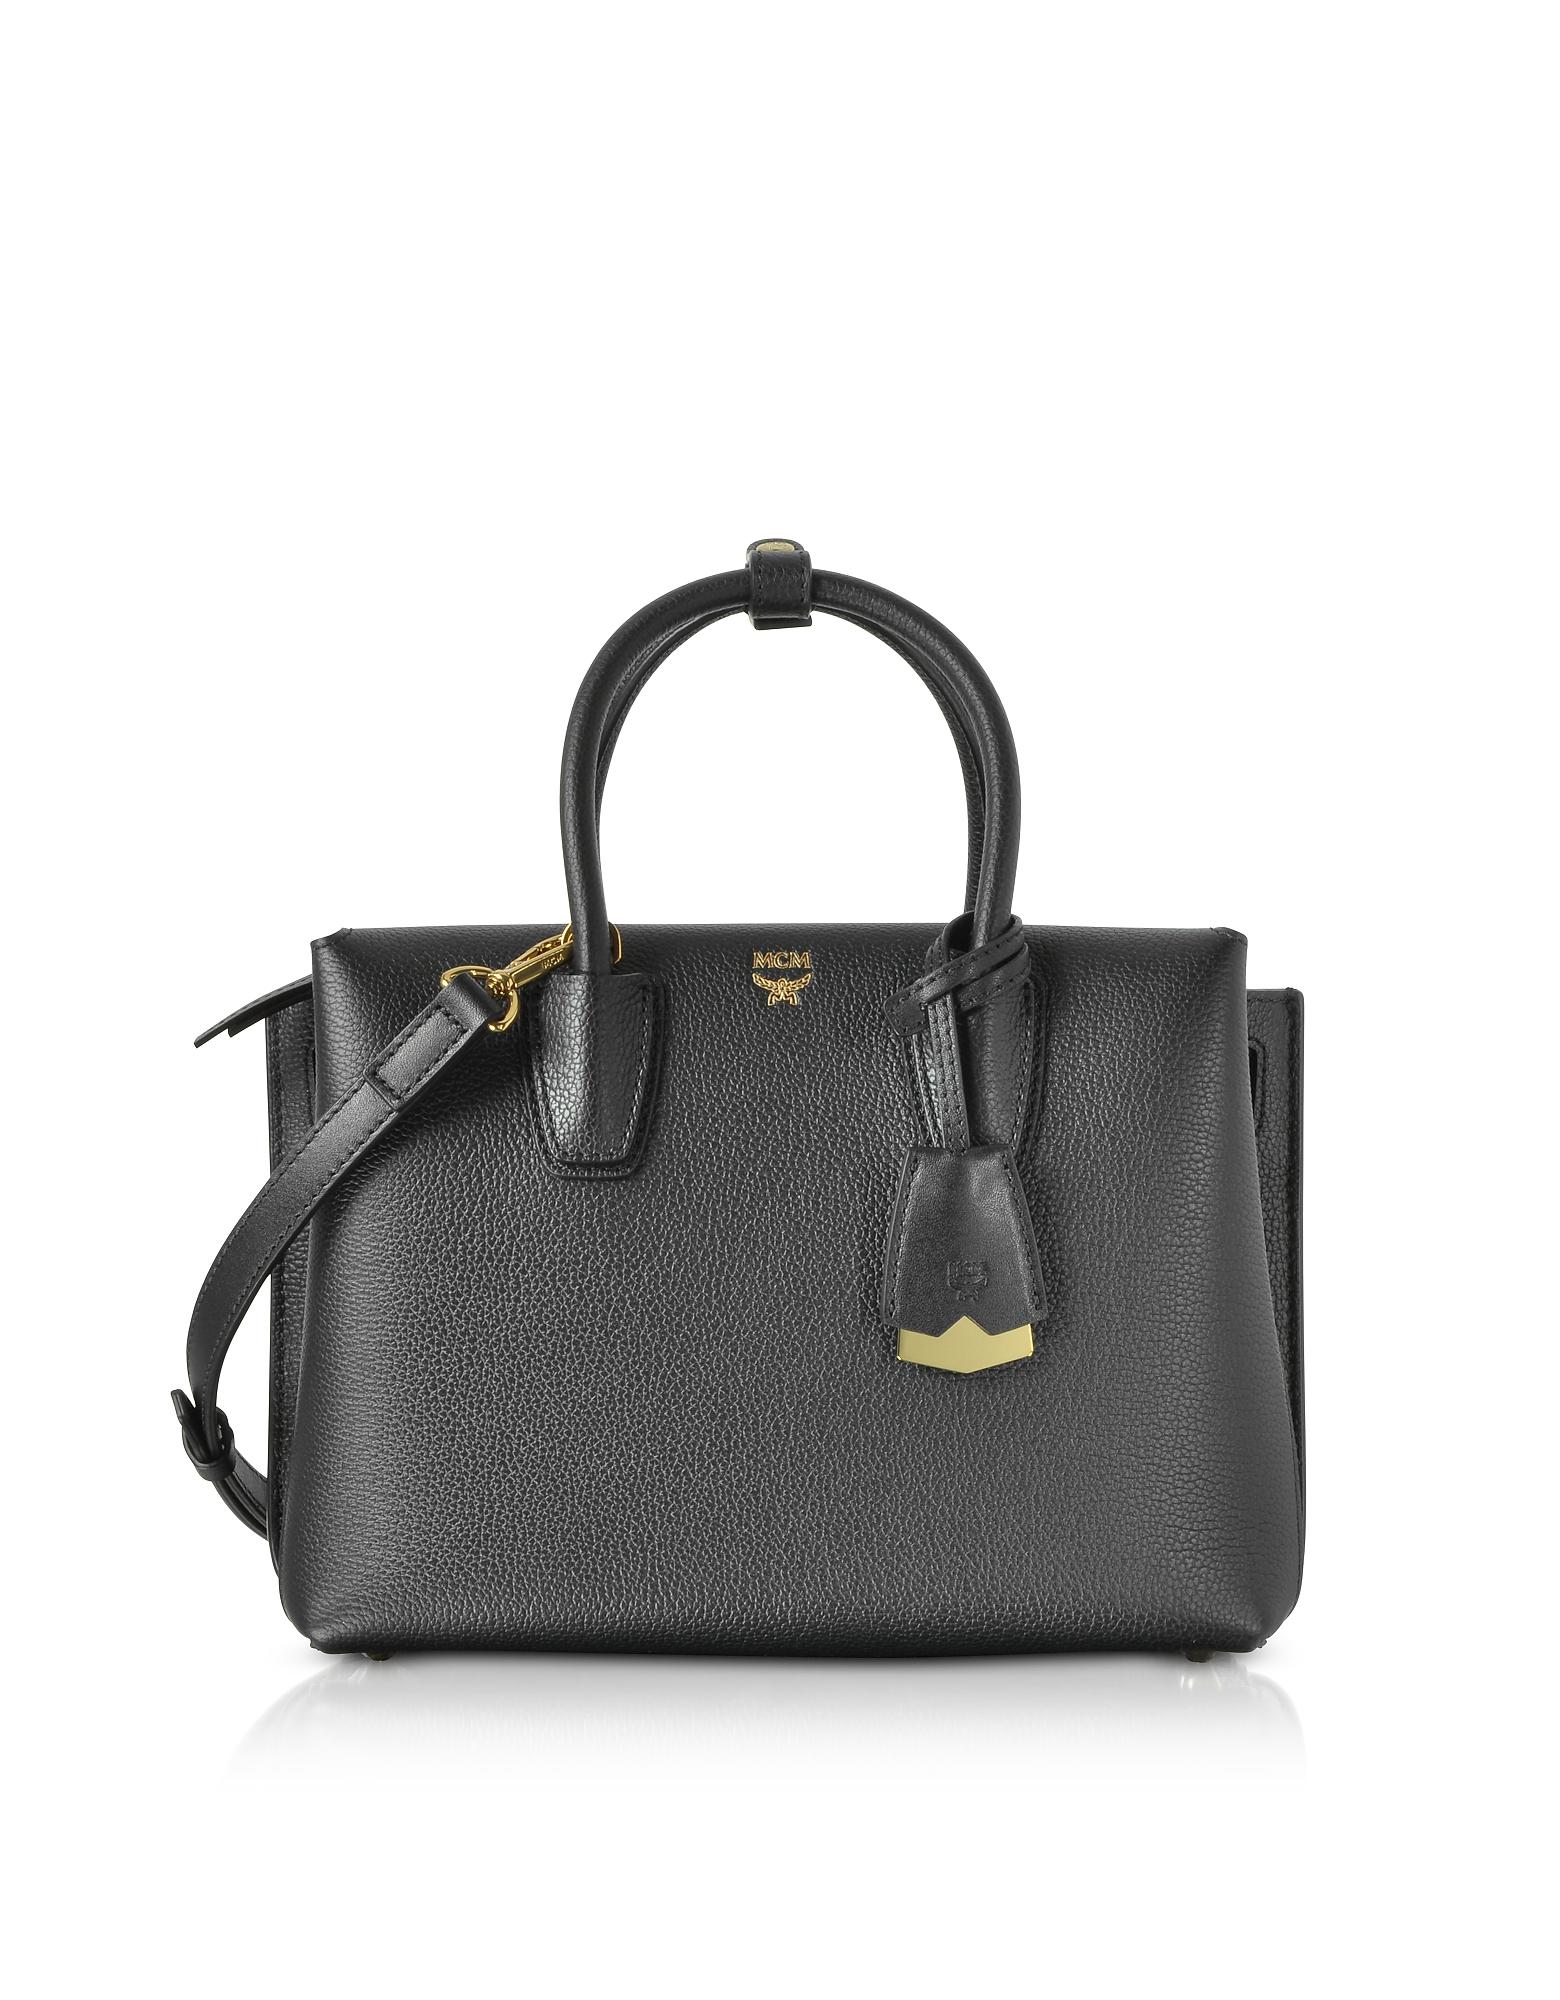 MCM Handbags, Neo Milla Black Leather Small Tote Bag